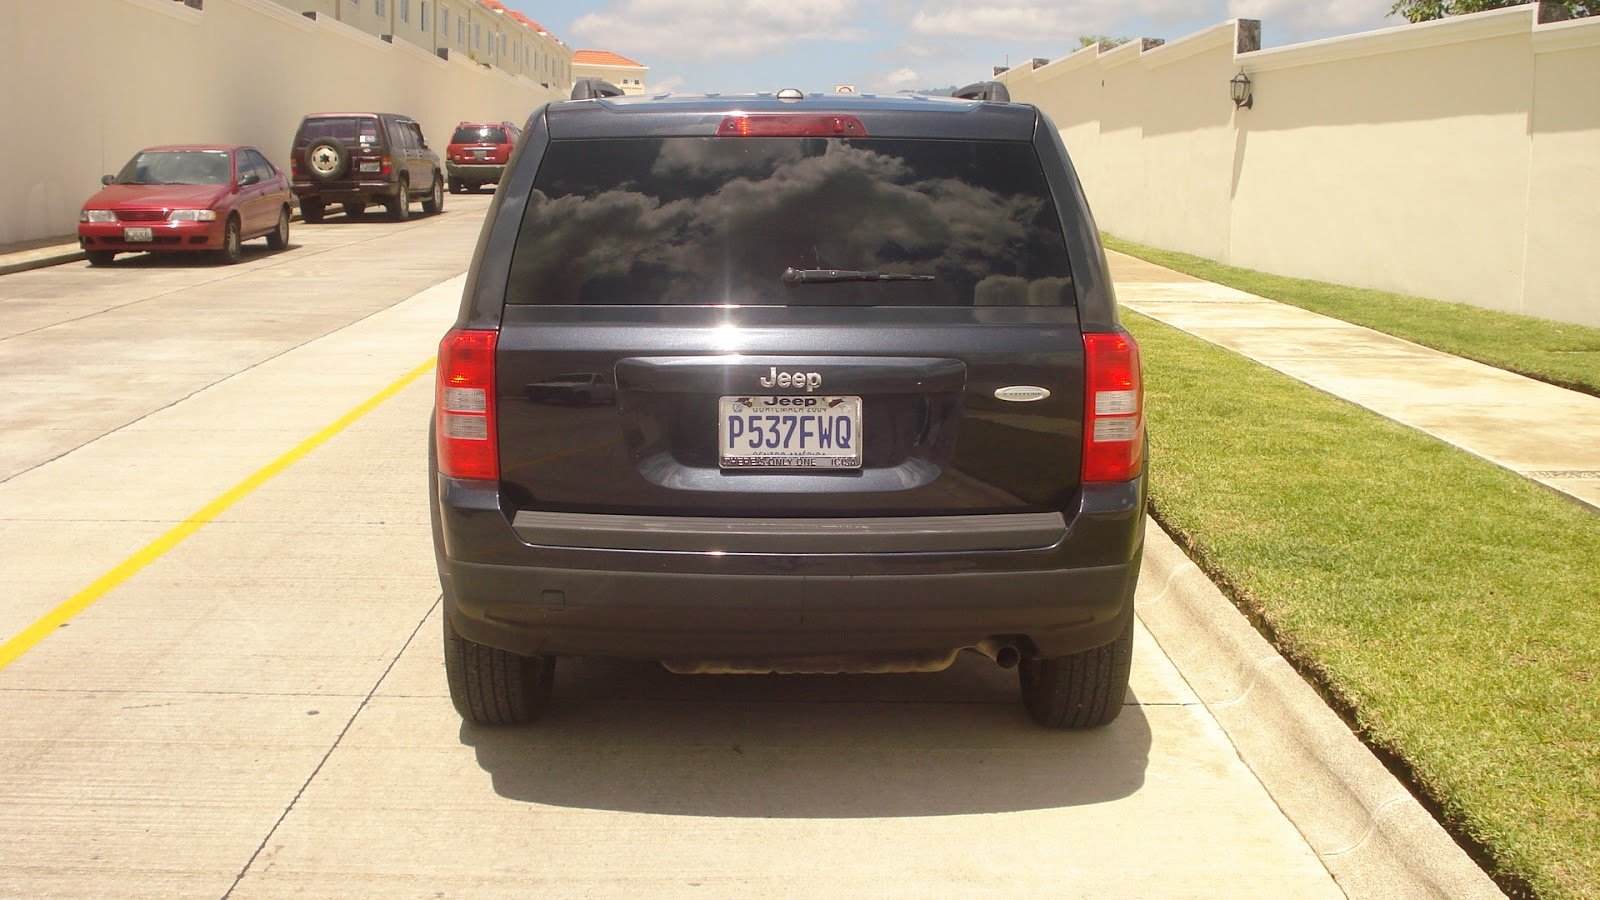 IMPORTMYM: Jeep Patriot 2014